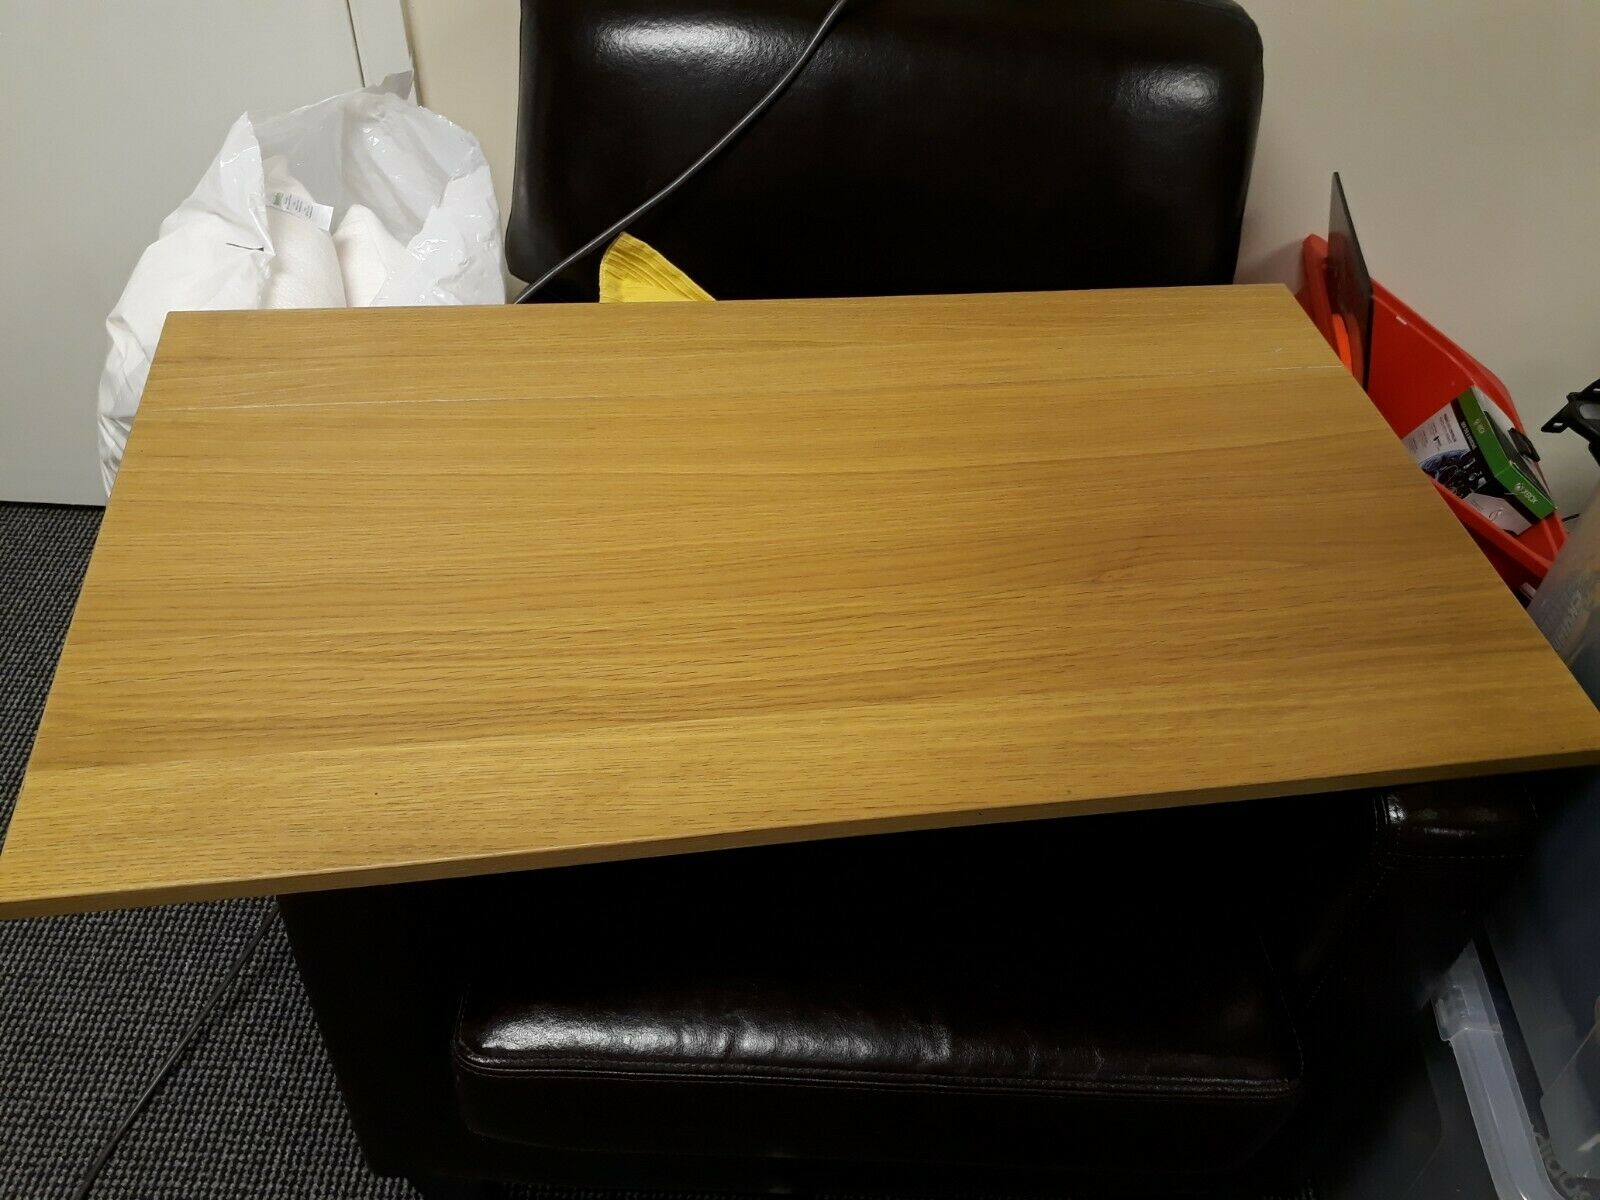 Ikea Antilop Wall Mounted Baby Change Folding Table For Sale Ebay